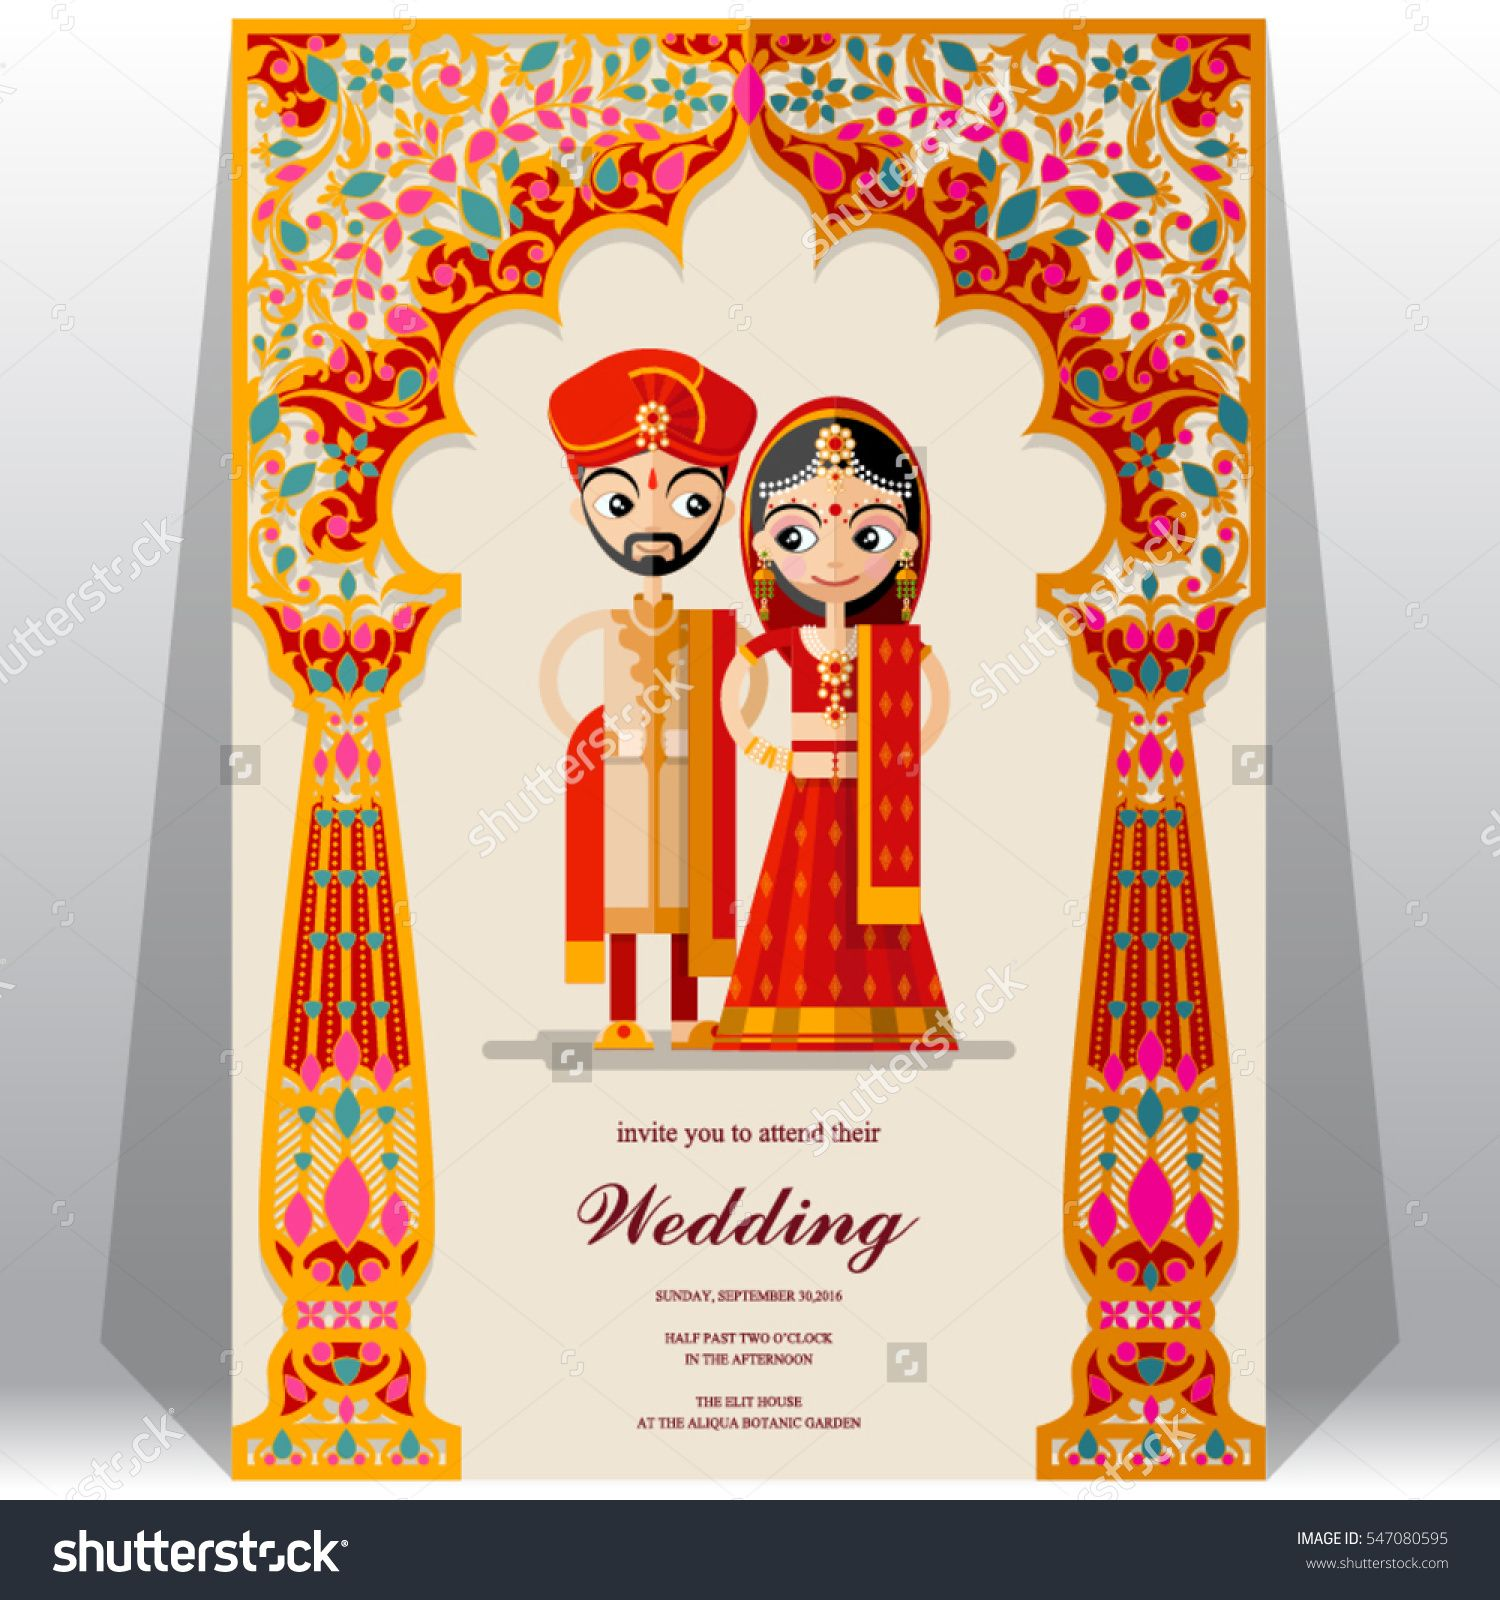 stock-vector-indian-wedding-invitation-card-547080595.jpg 1,500 ...